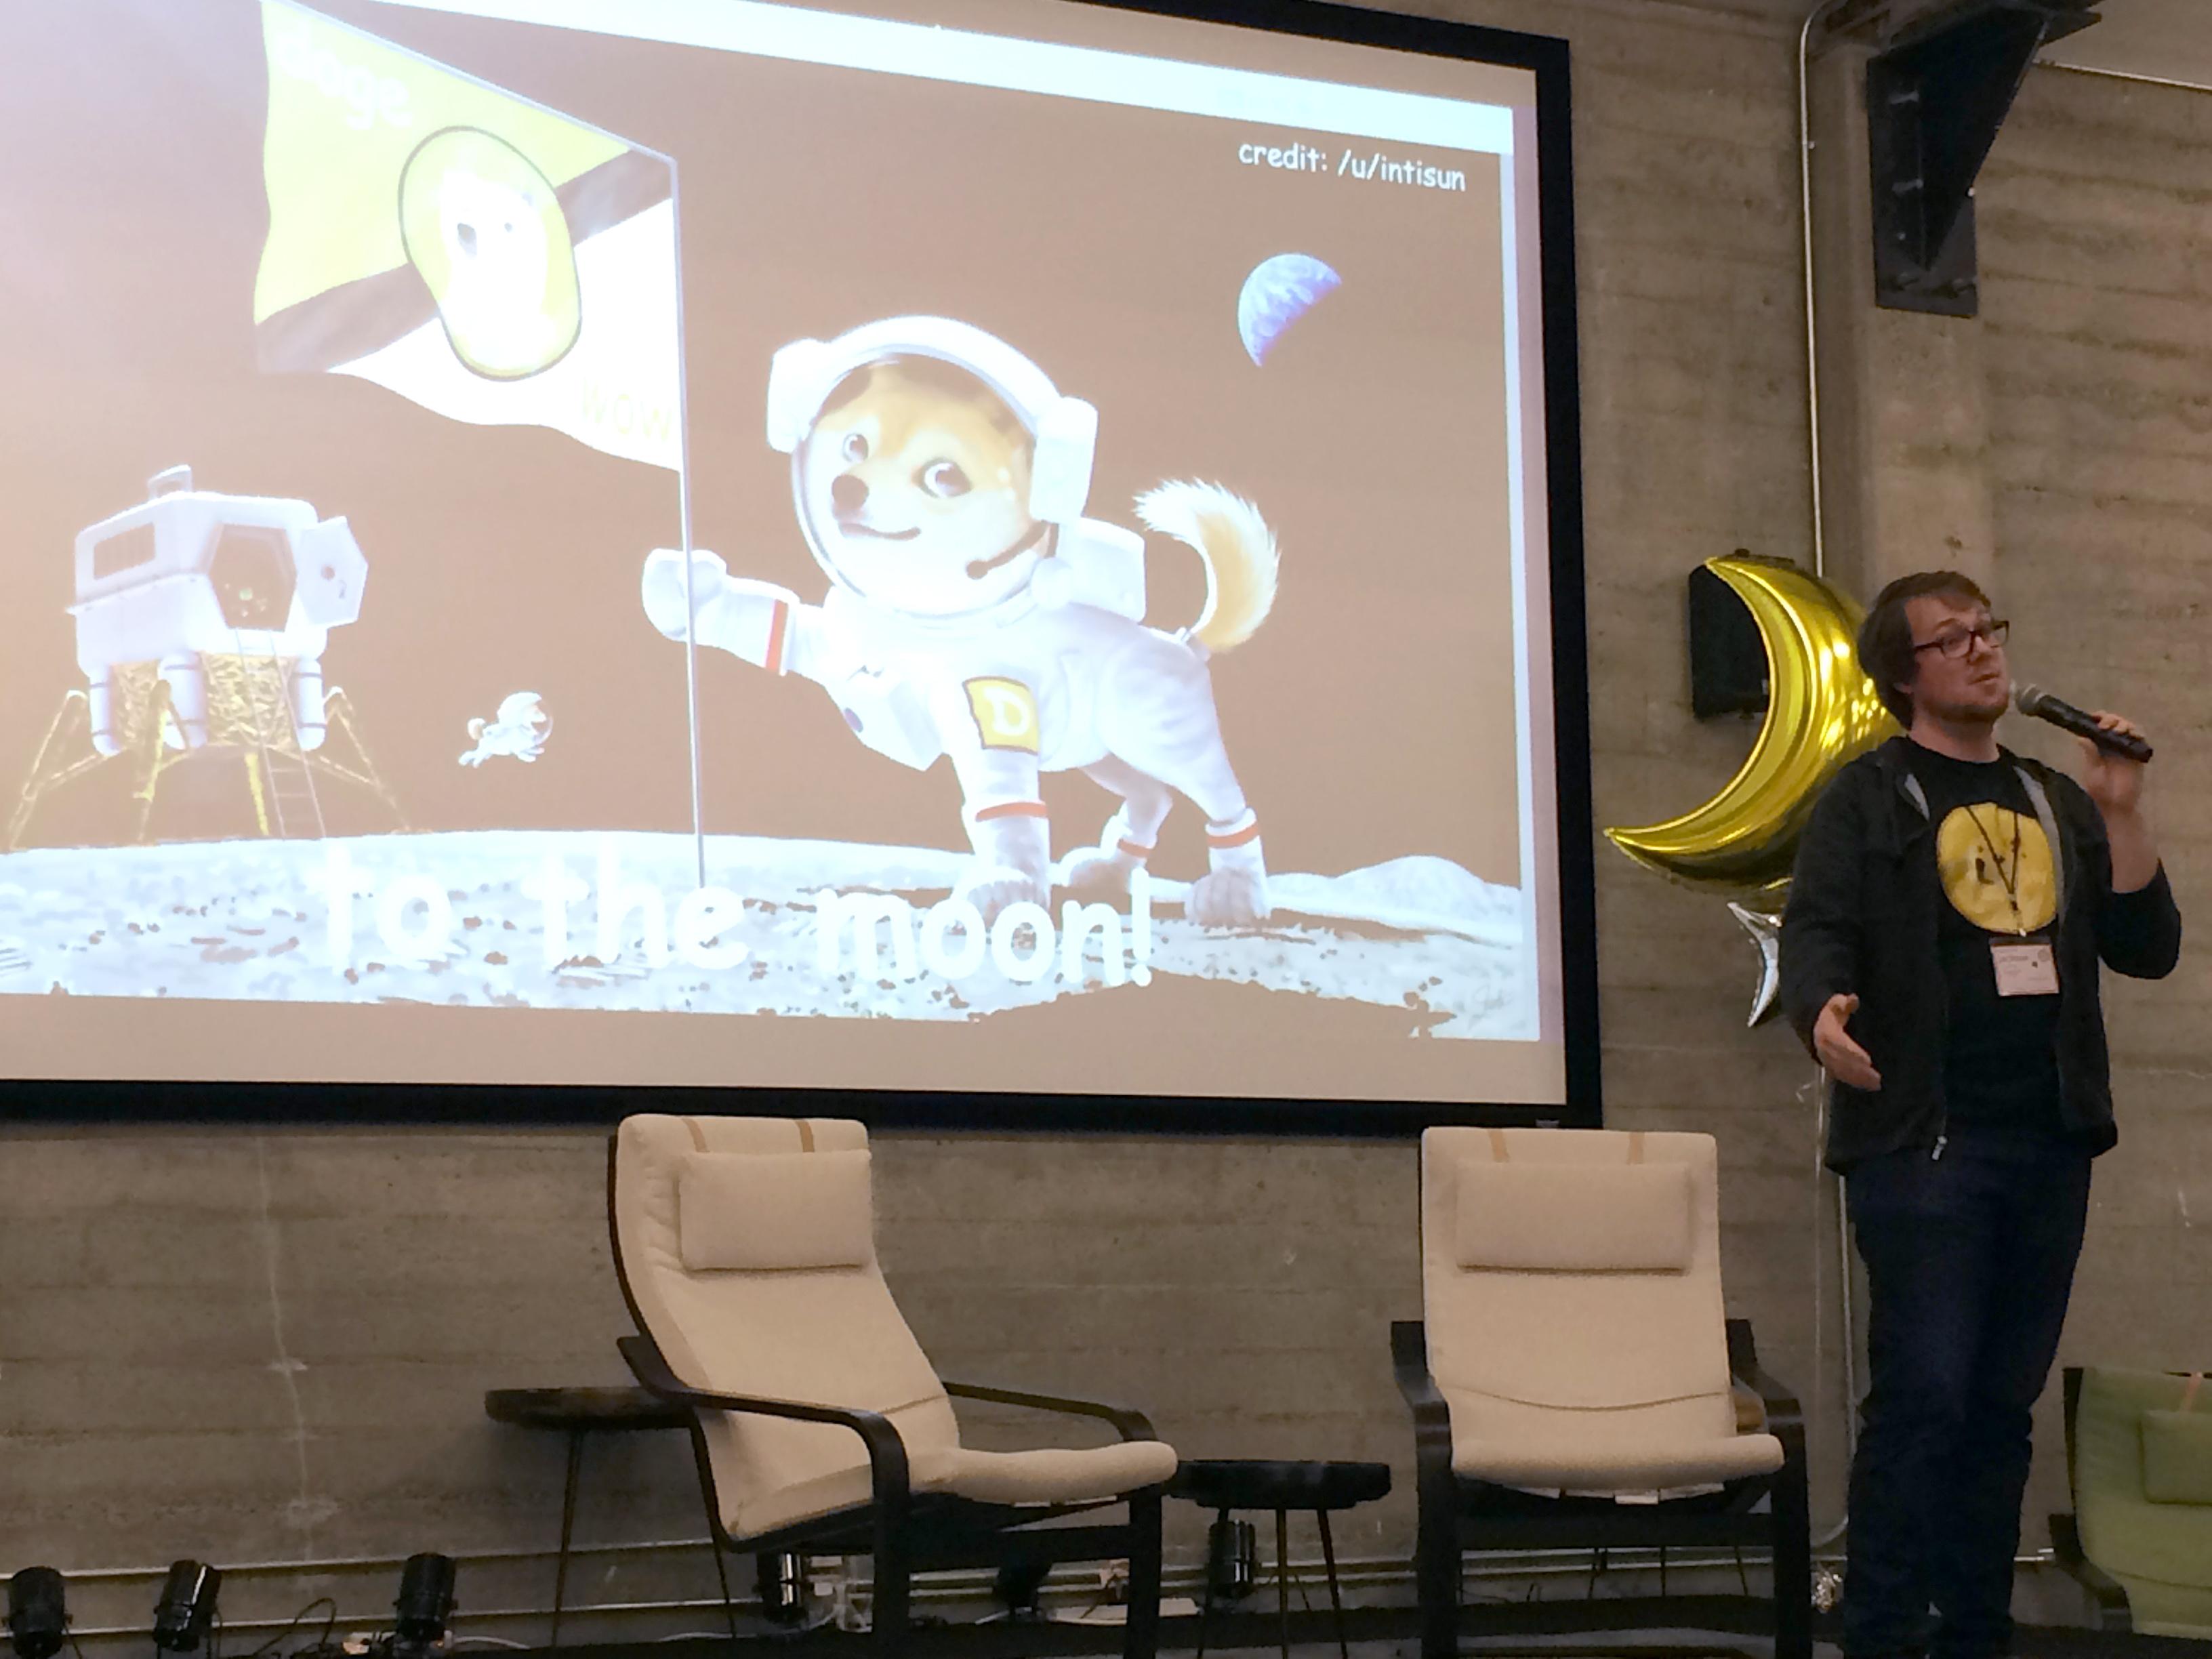 Jackson Palmer, co-founder of Dogecoin, speaks at Dogecon on Friday, April 25. Photo by Biz Carson/Gigaom